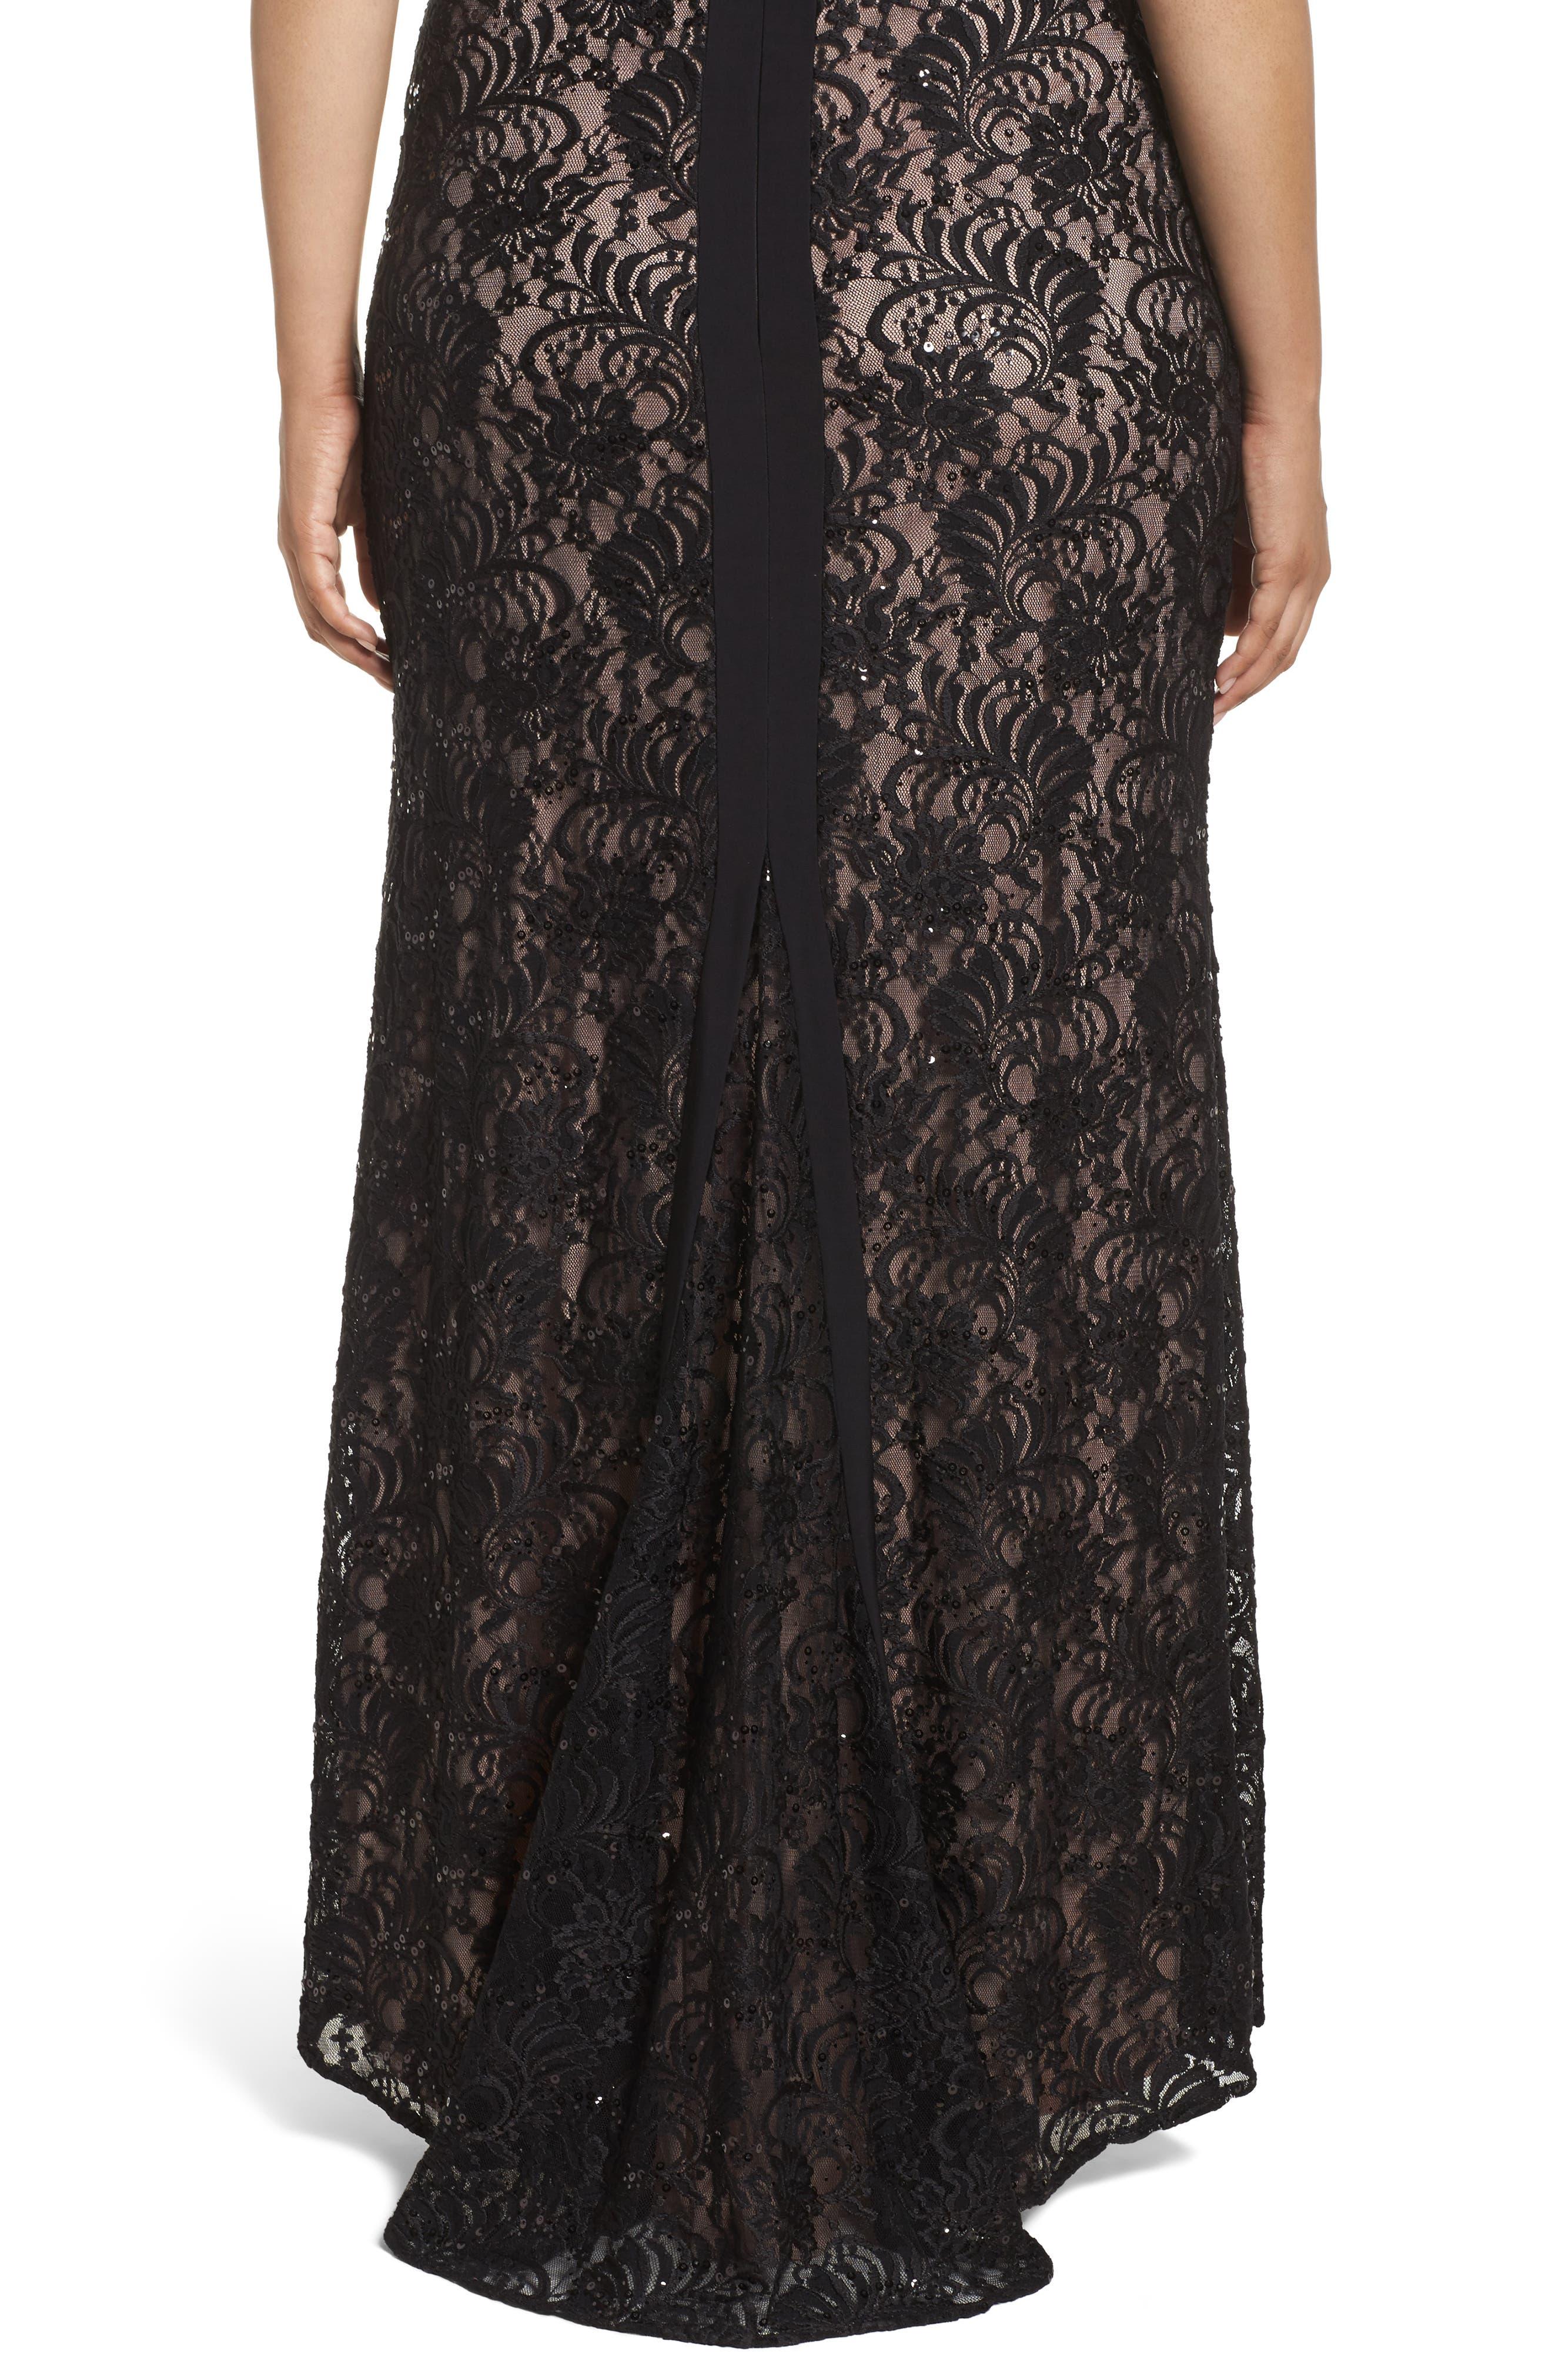 Lace Square Neck Gown,                             Alternate thumbnail 4, color,                             Black/ Nude